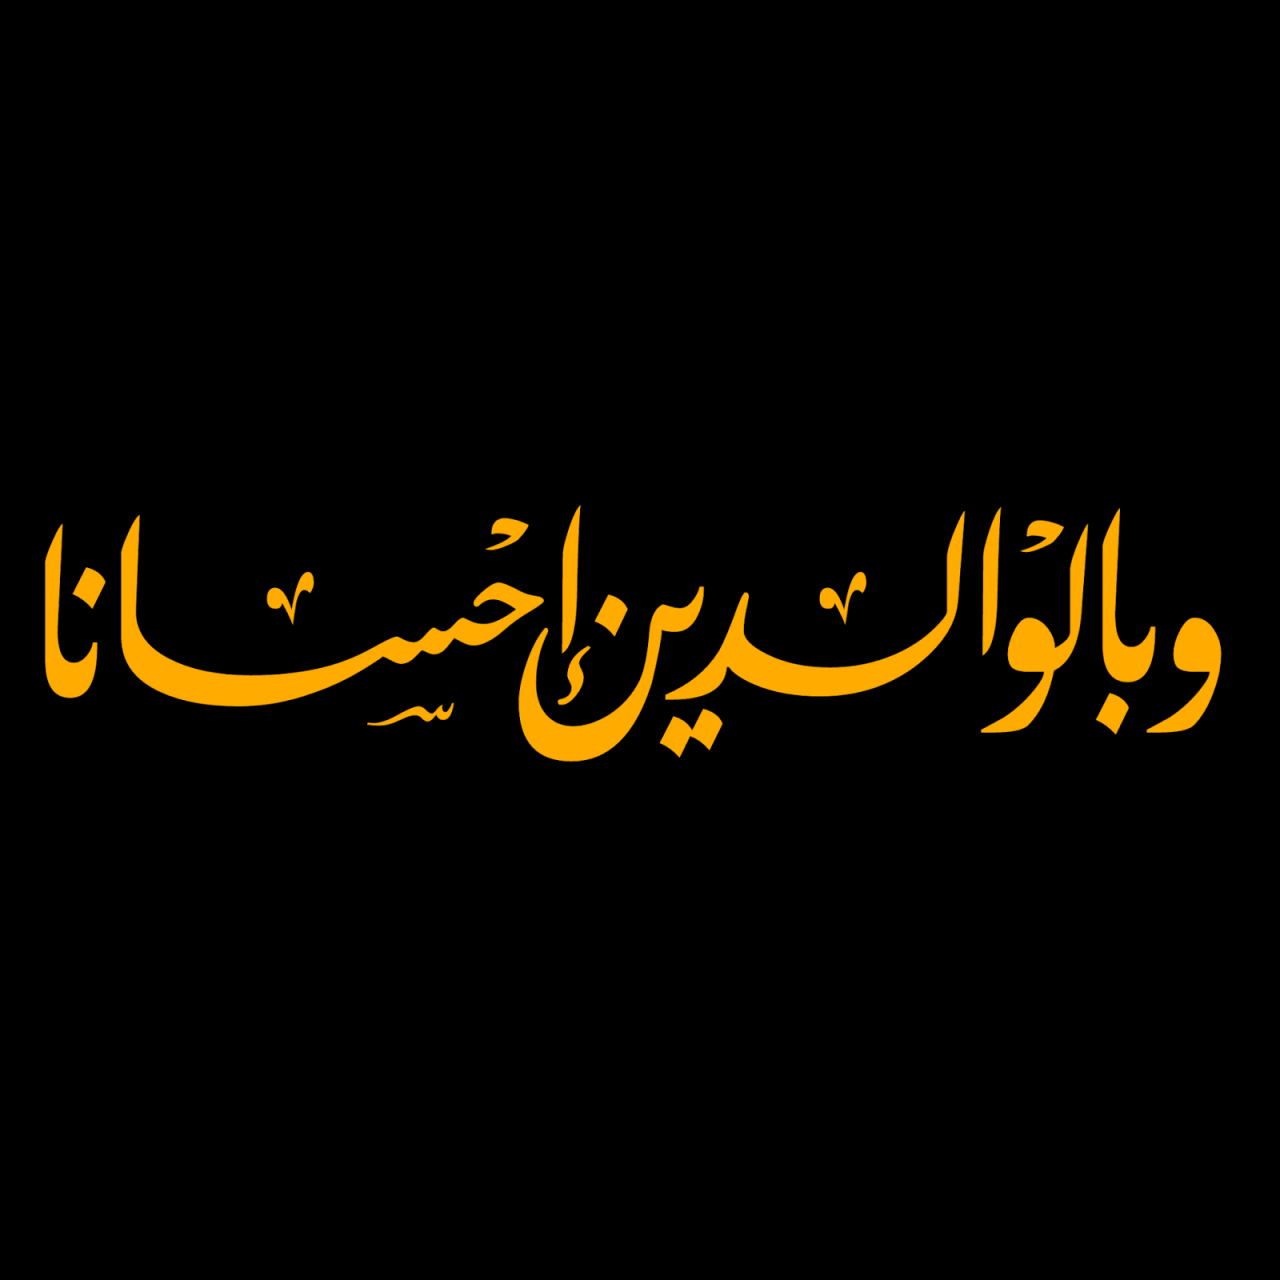 صورة عبارات اسلاميه , اجمل العبارات الاسلاميه الرائعه